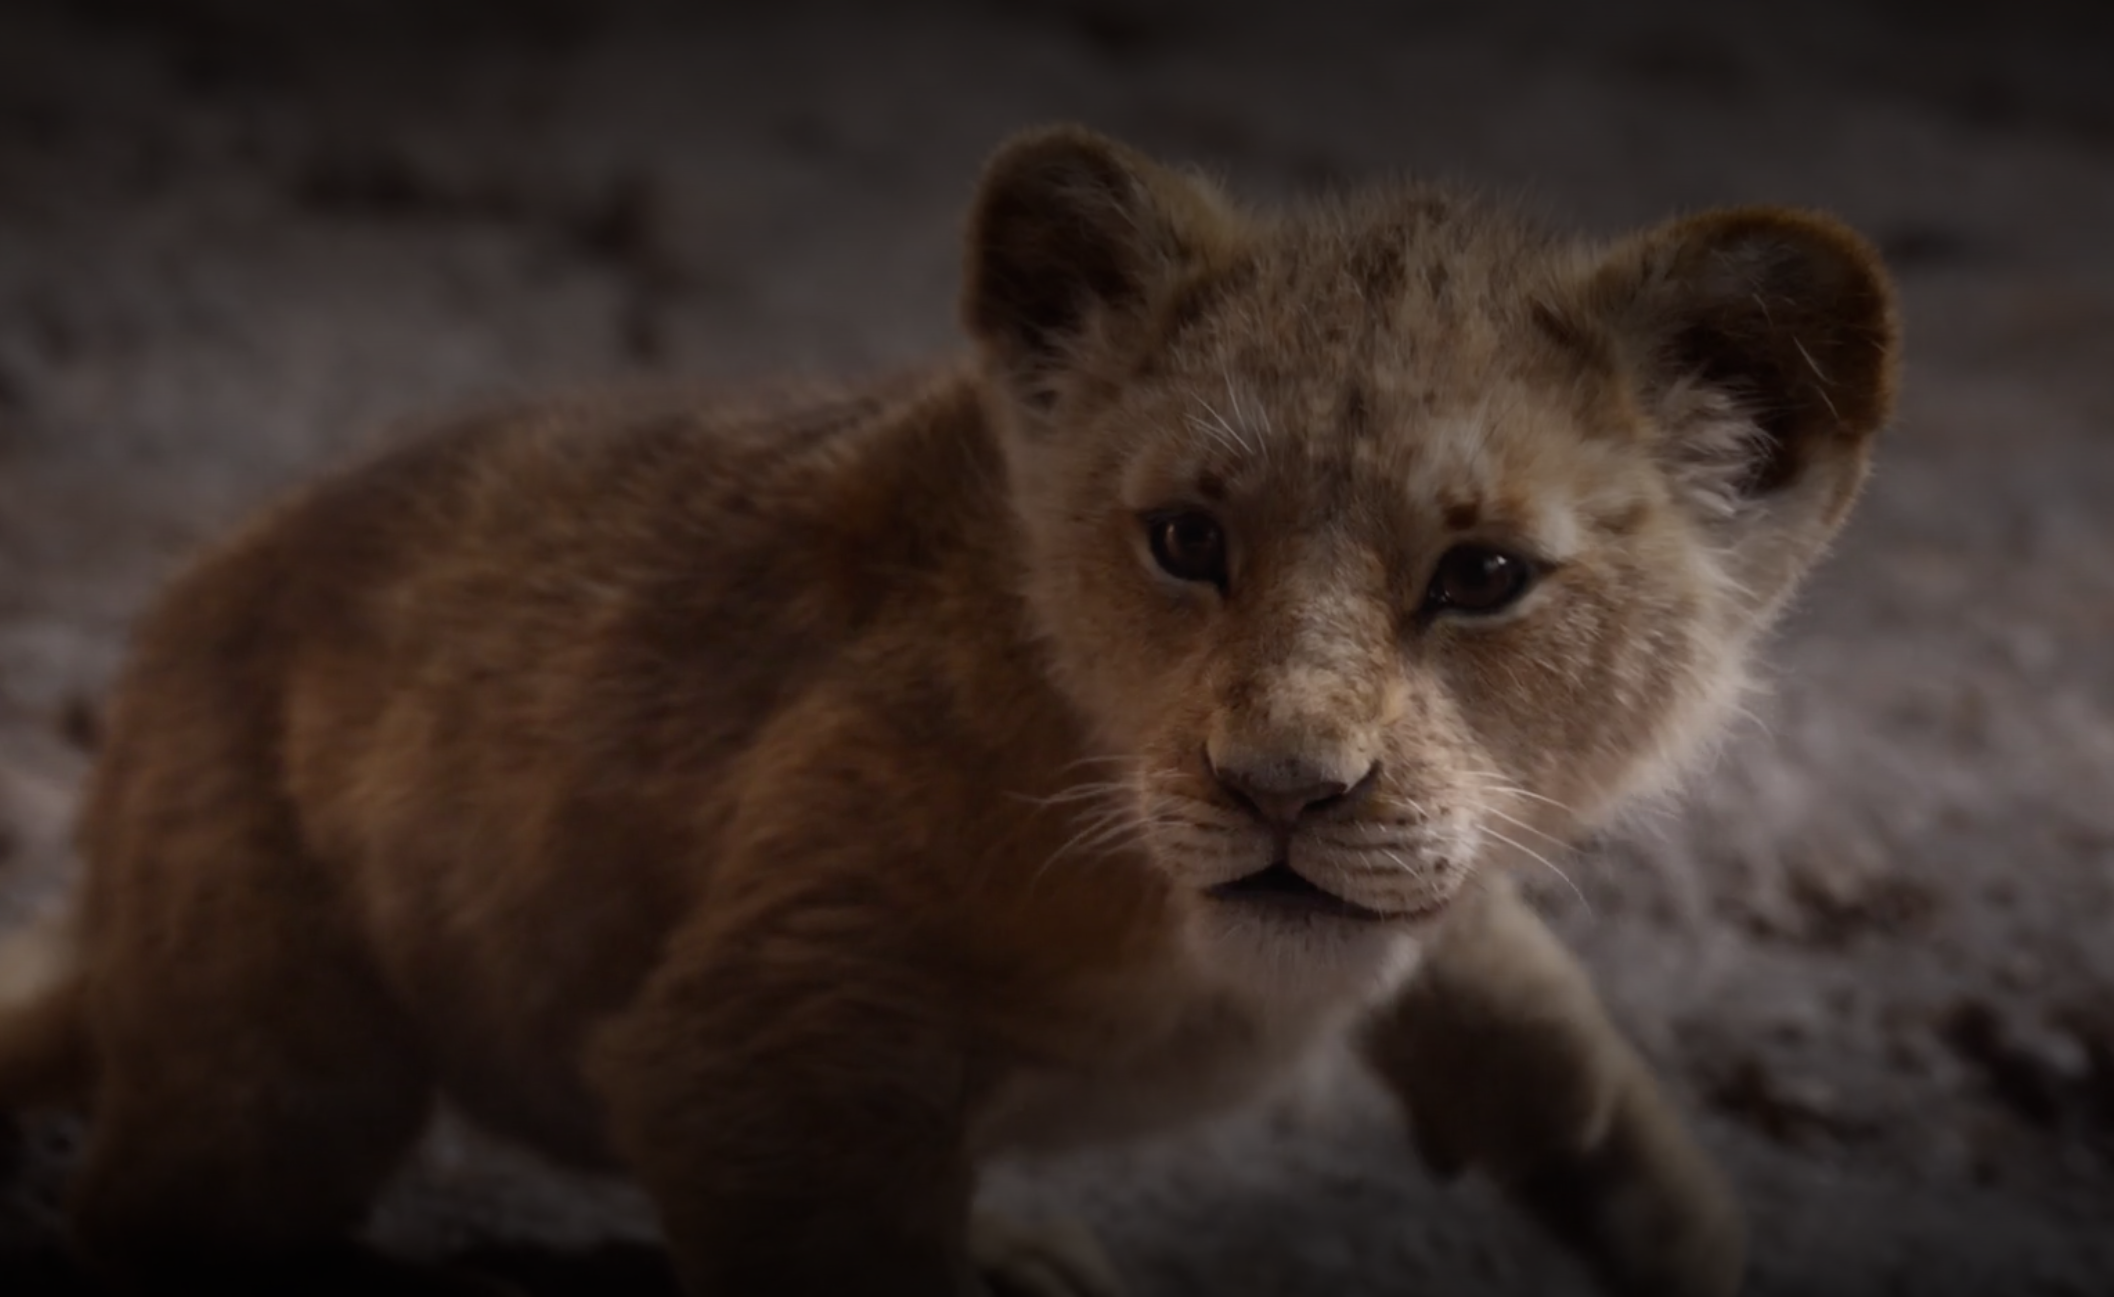 How Jon Favreau Directed The Lion King In Virtual